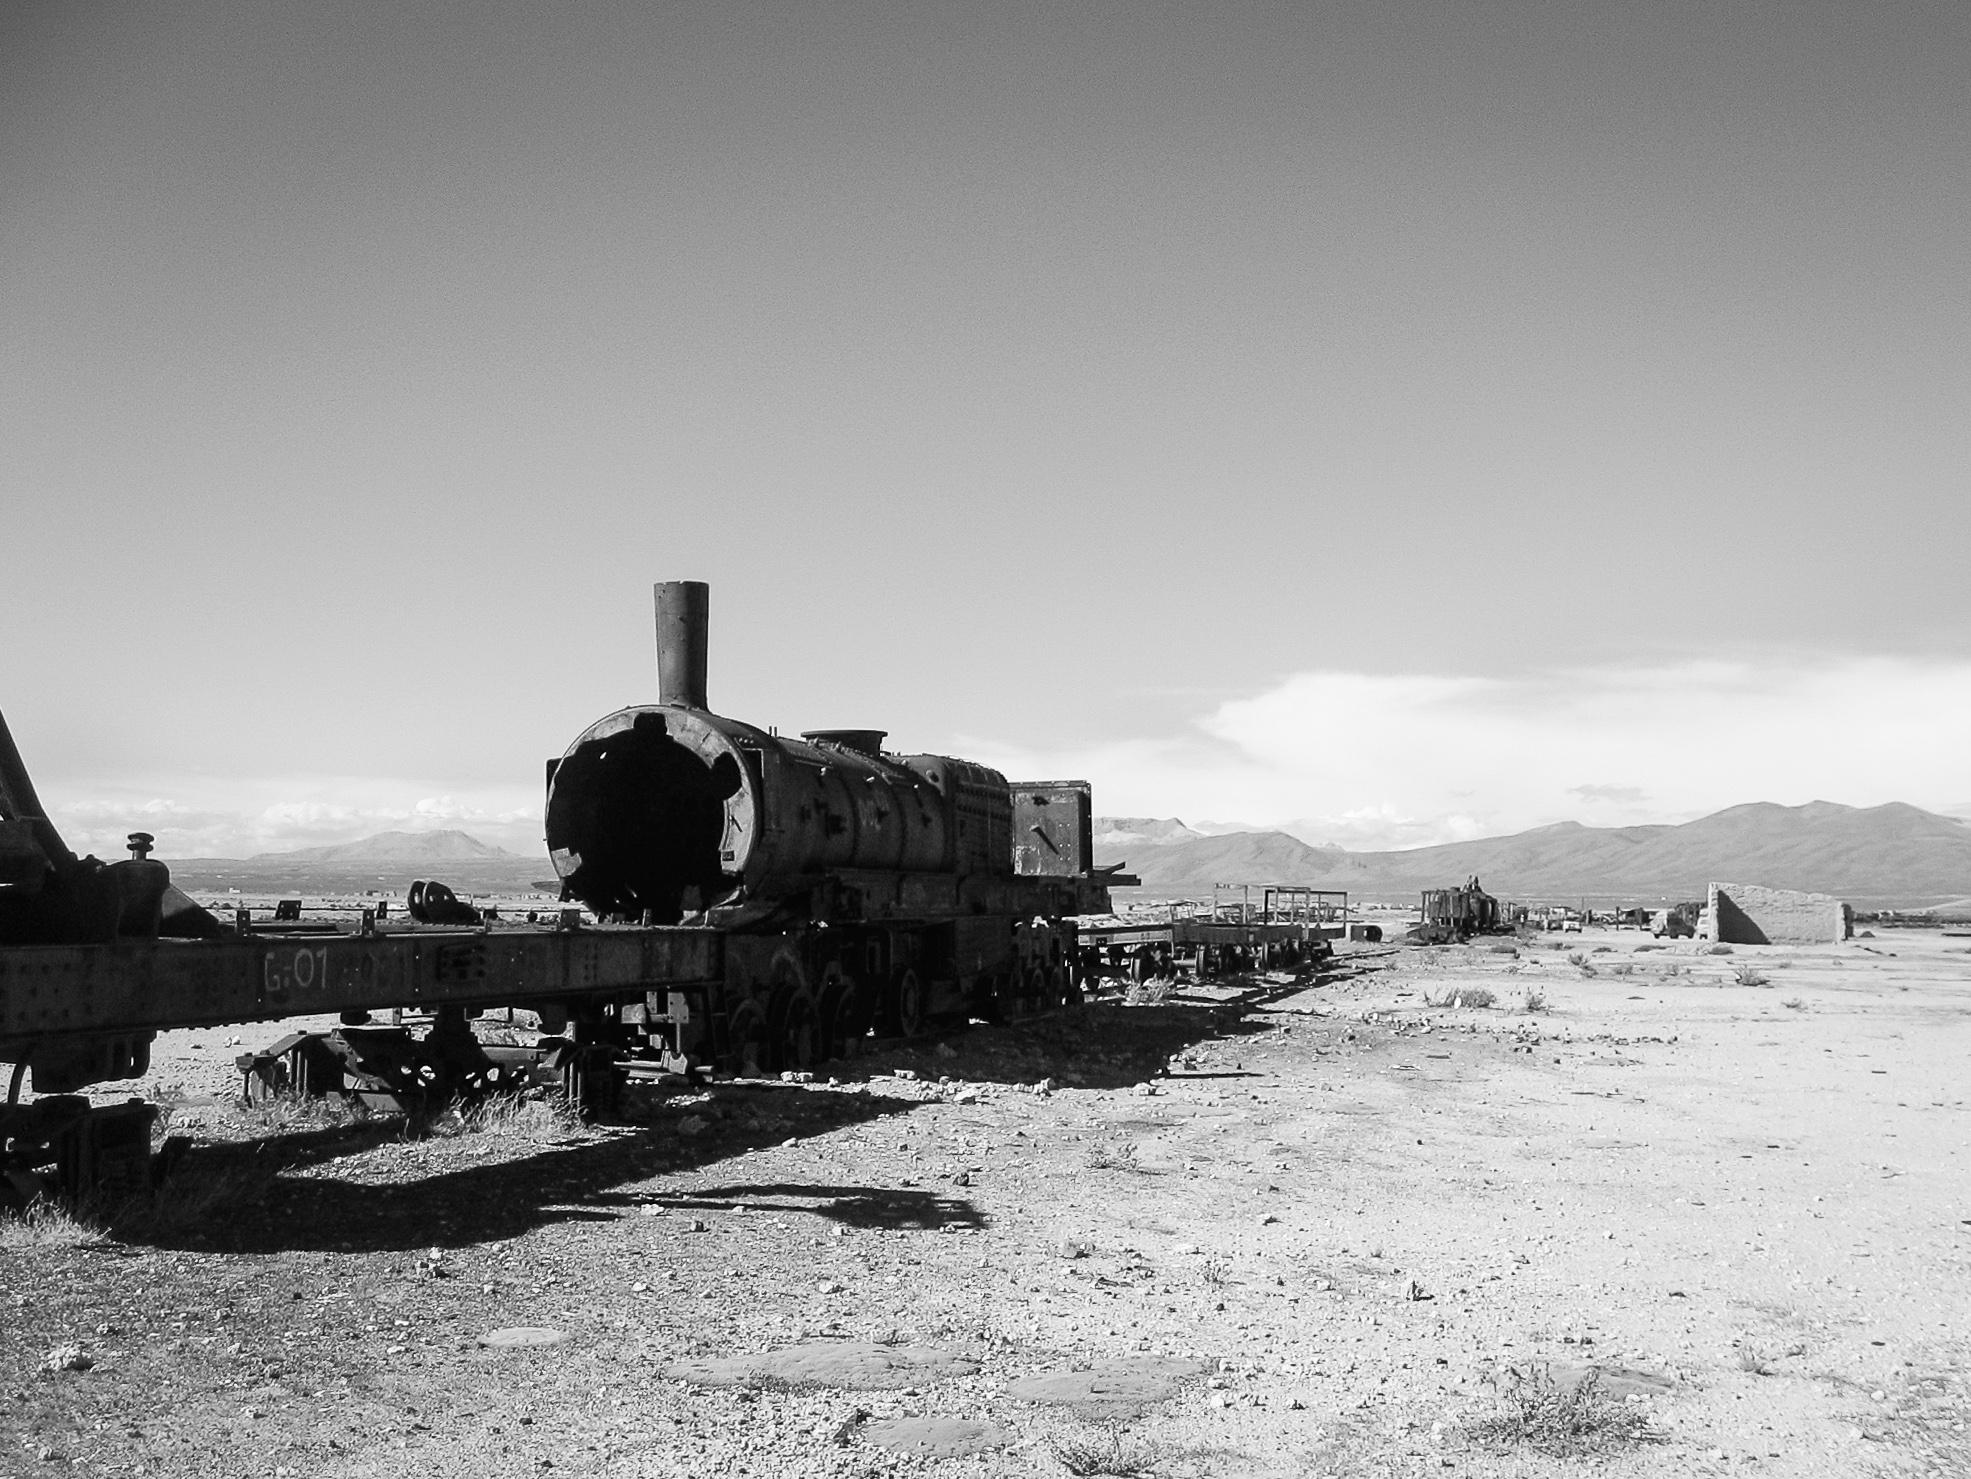 uyuni_salt-flats_day1-8691-train-graveyard.jpg